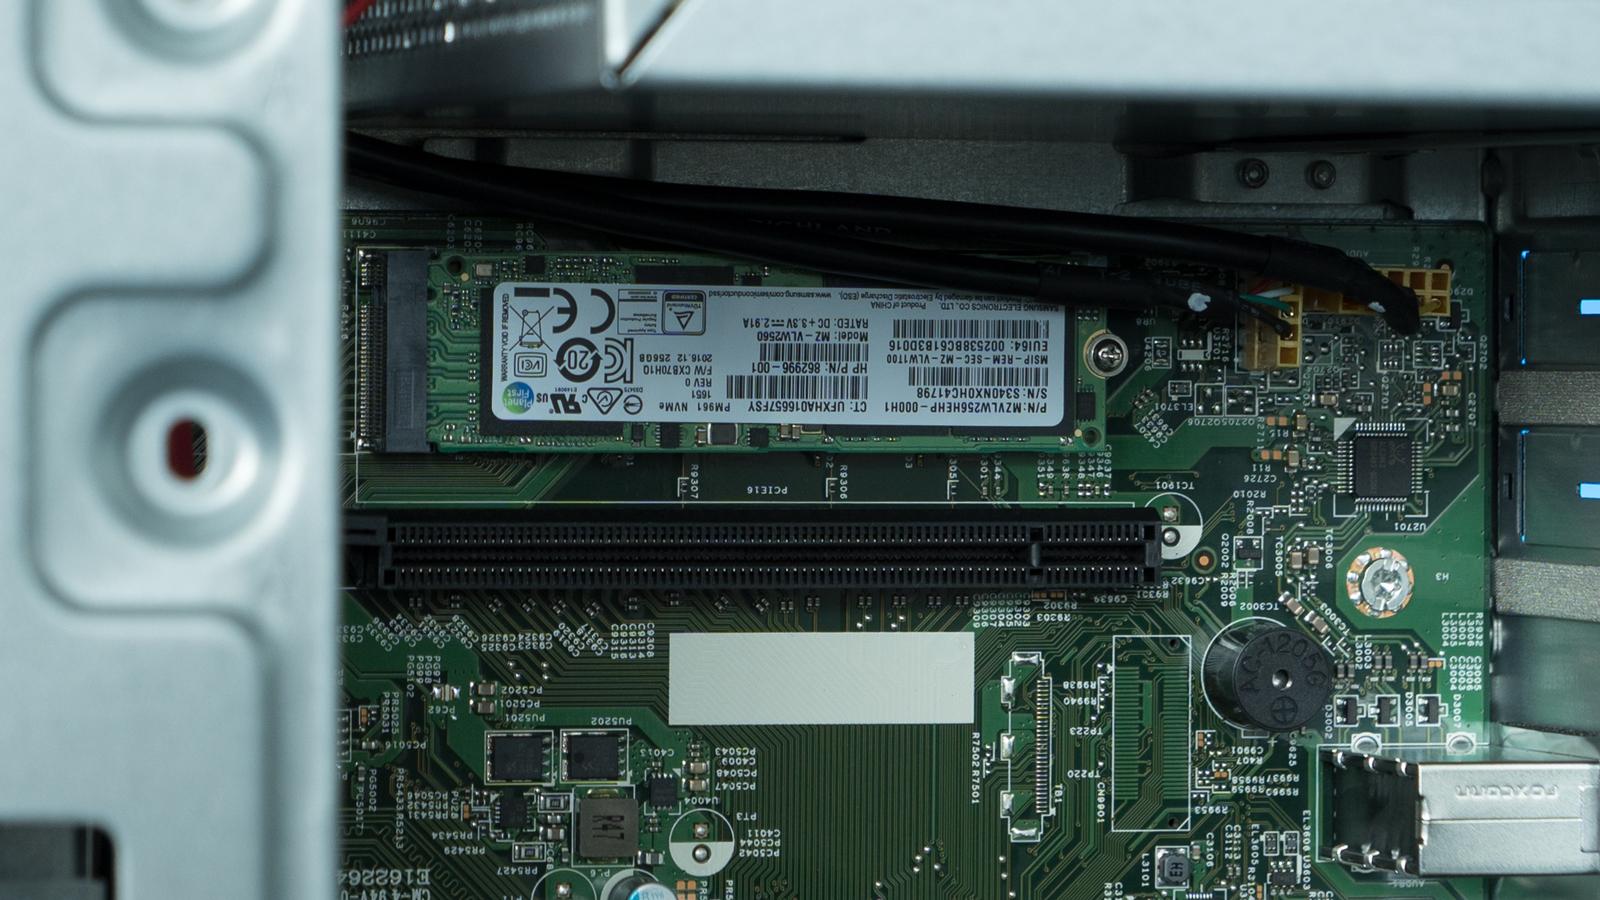 Intel Core i5 vs  Intel Pentium - braucht man den 'großen' Quad-Core?